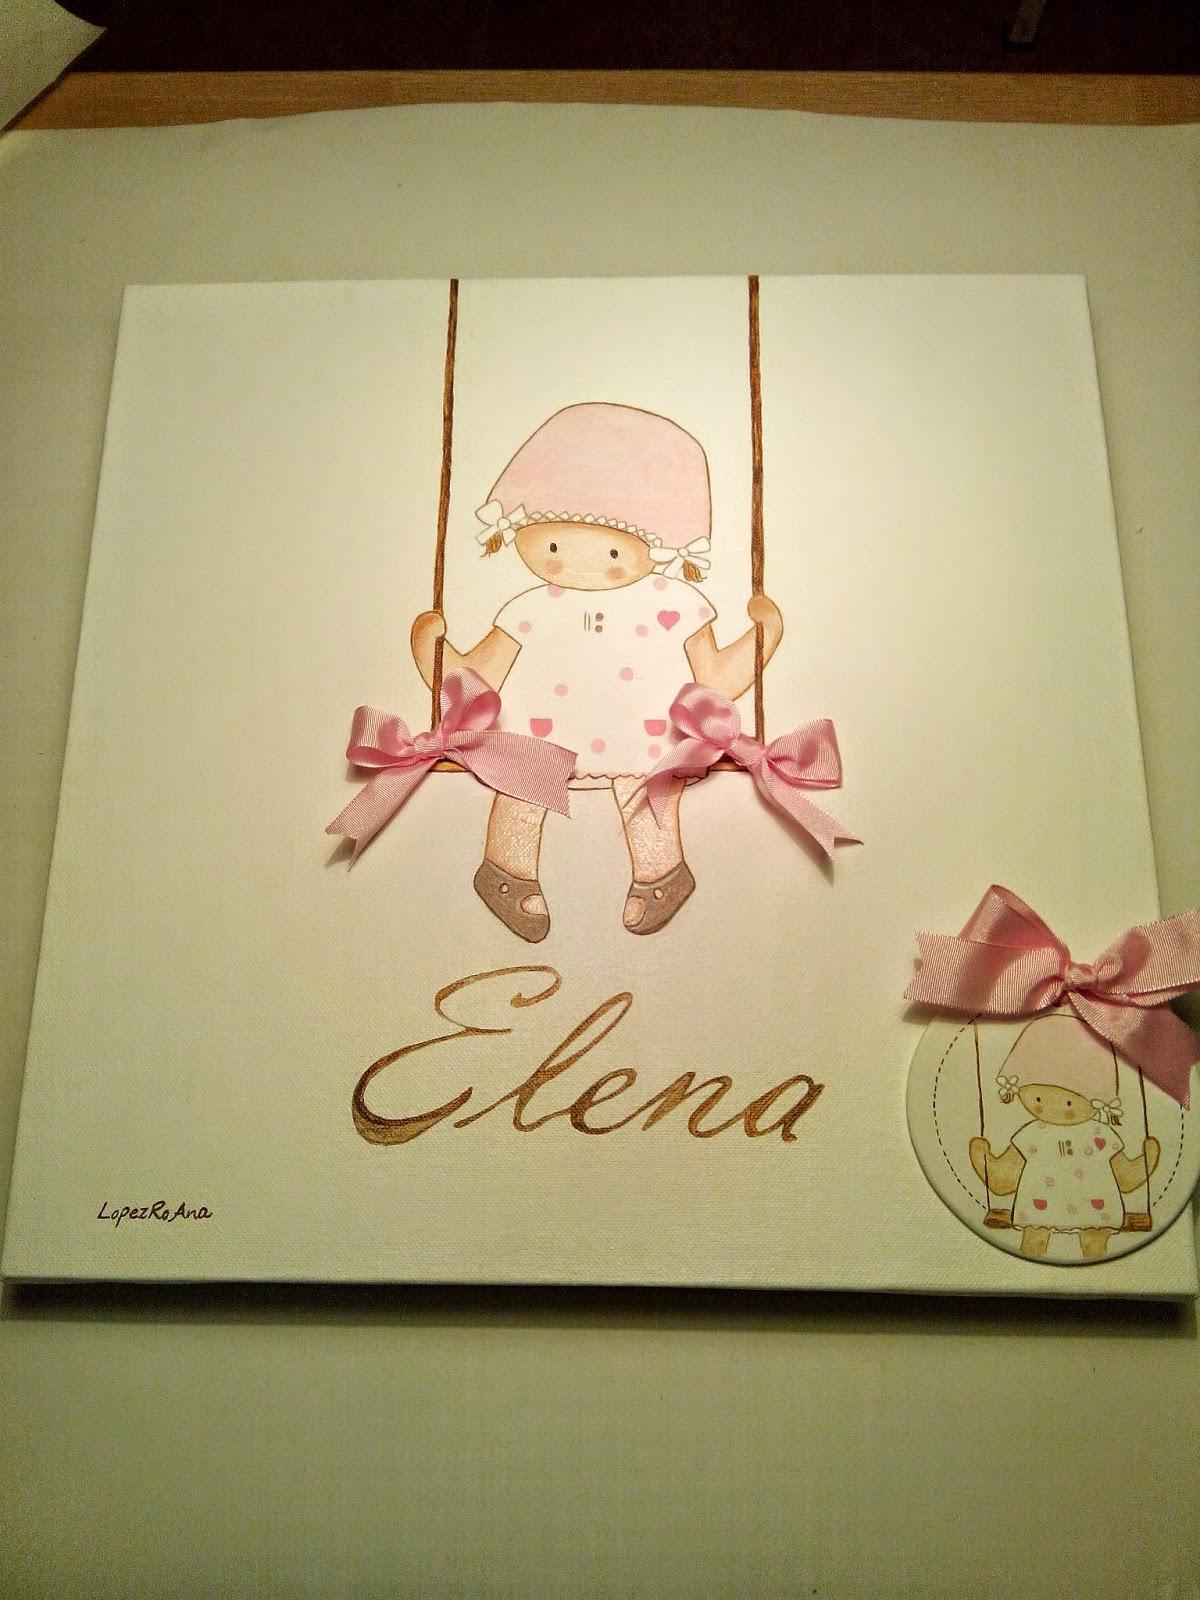 Decoraci n infantil personalizada lopezroana cuadros personalizados - Cuadros fotos personalizados ...